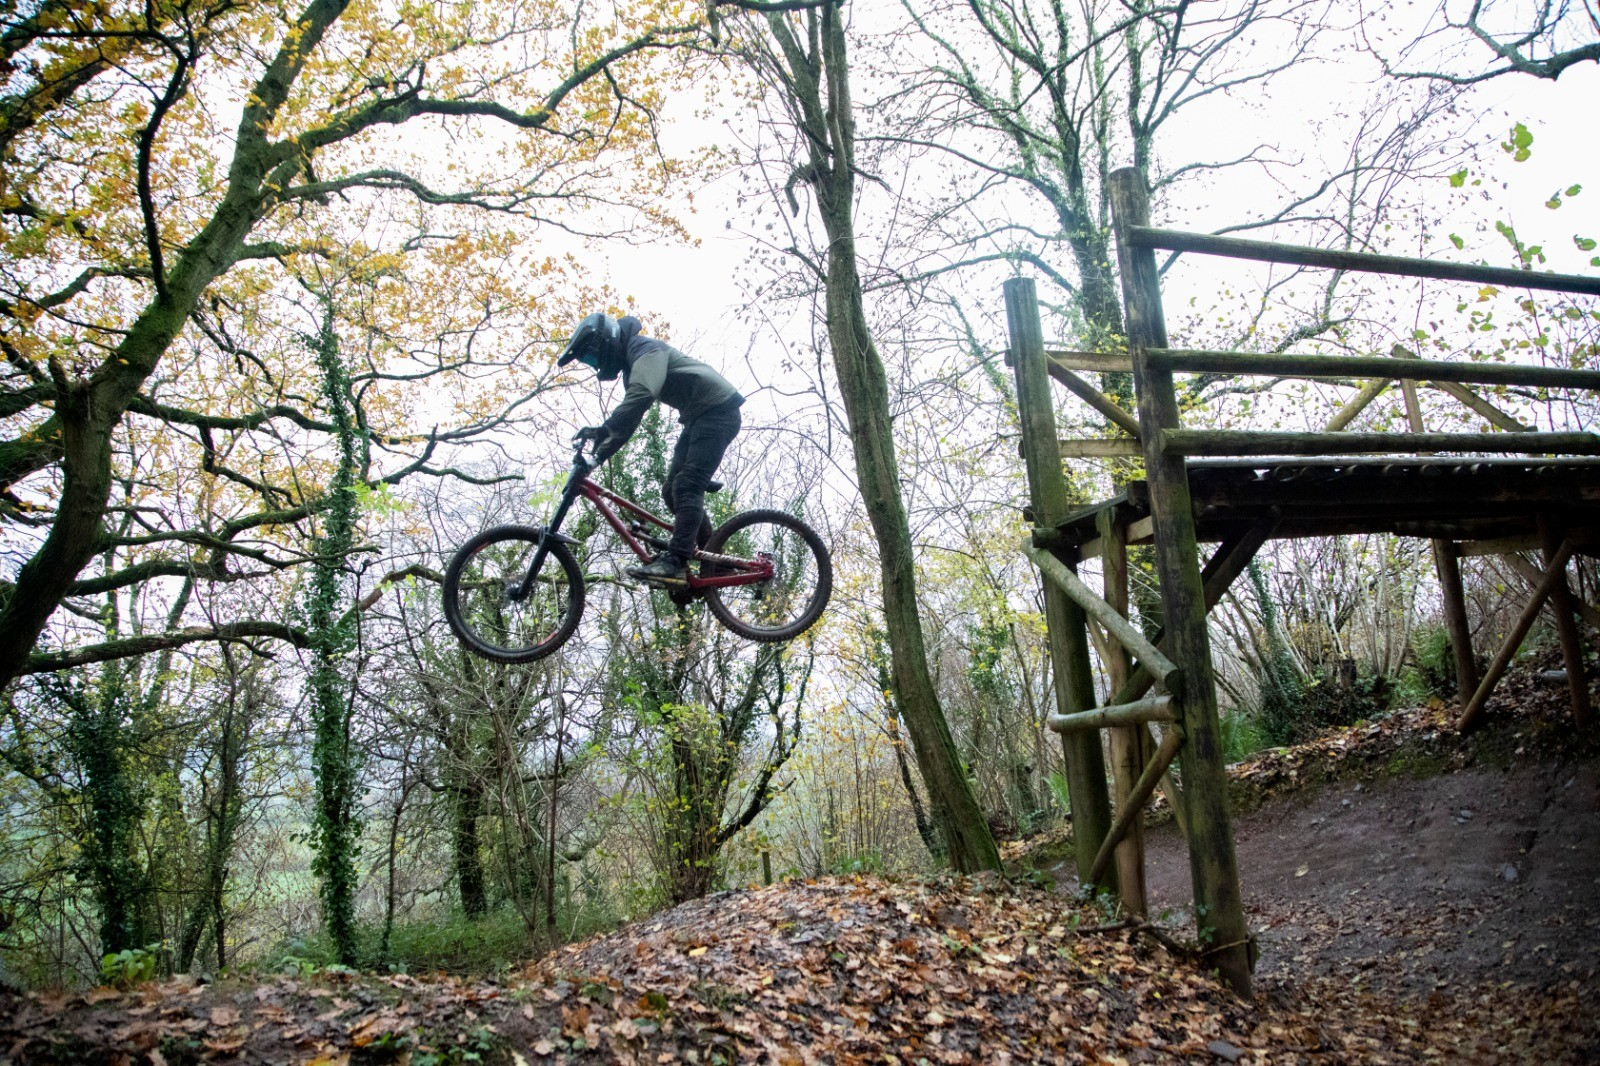 215C6D53-4FD9-44DA-B867-9E9C5CD5E095 - martin dunn - Mountain Biking Pictures - Vital MTB